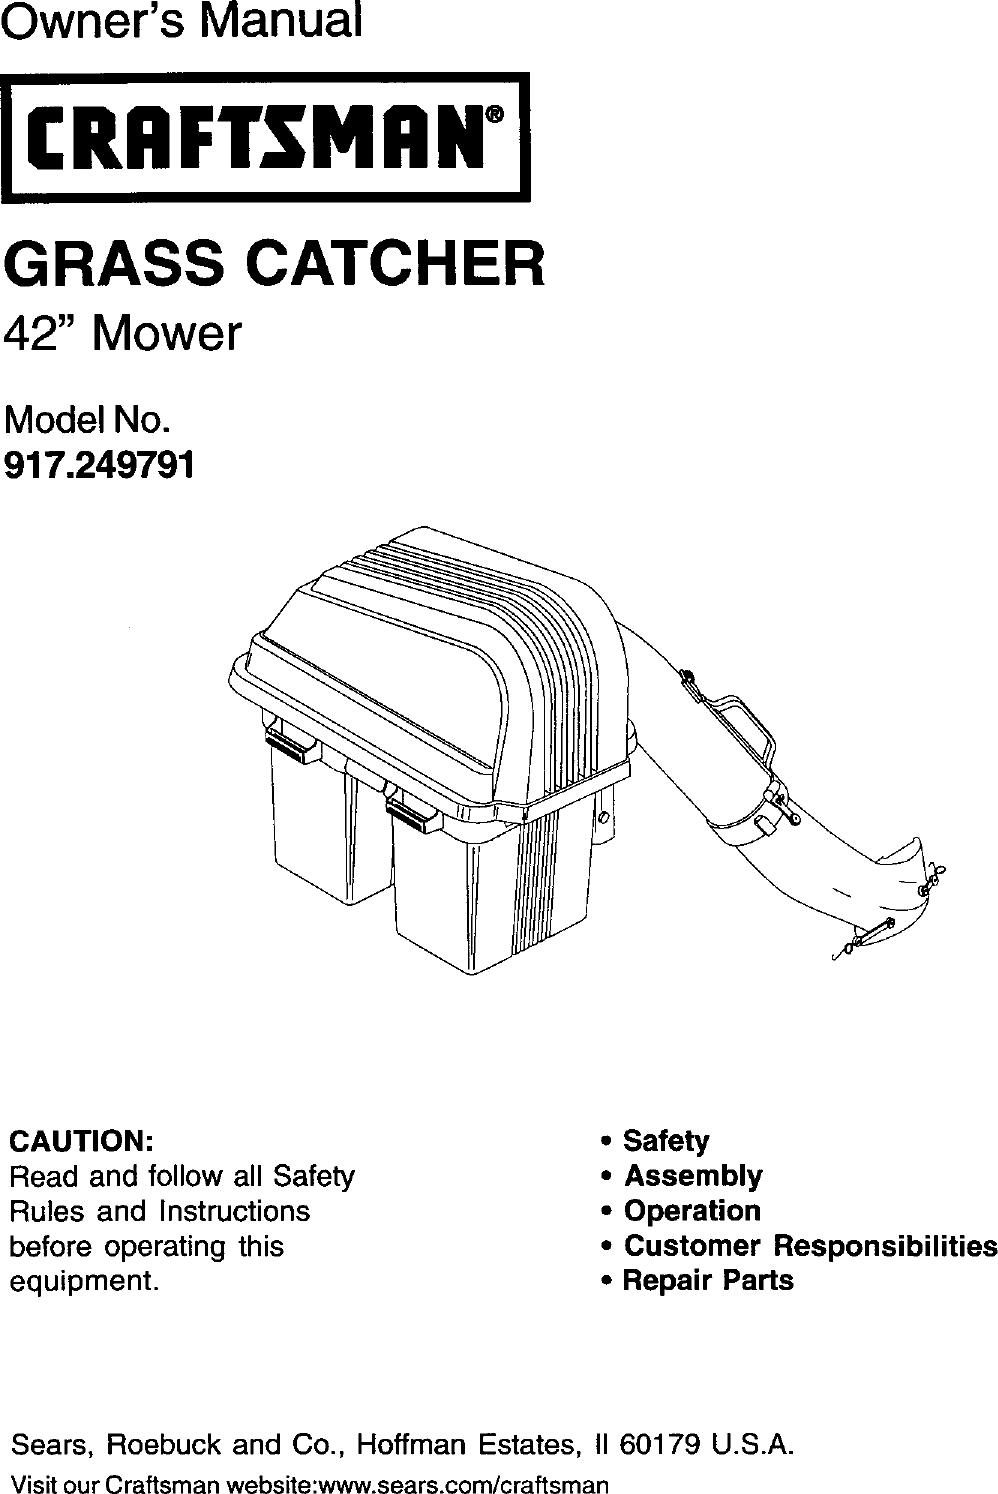 Craftsman 917249791 User Manual GRASS CATCHER Manuals And